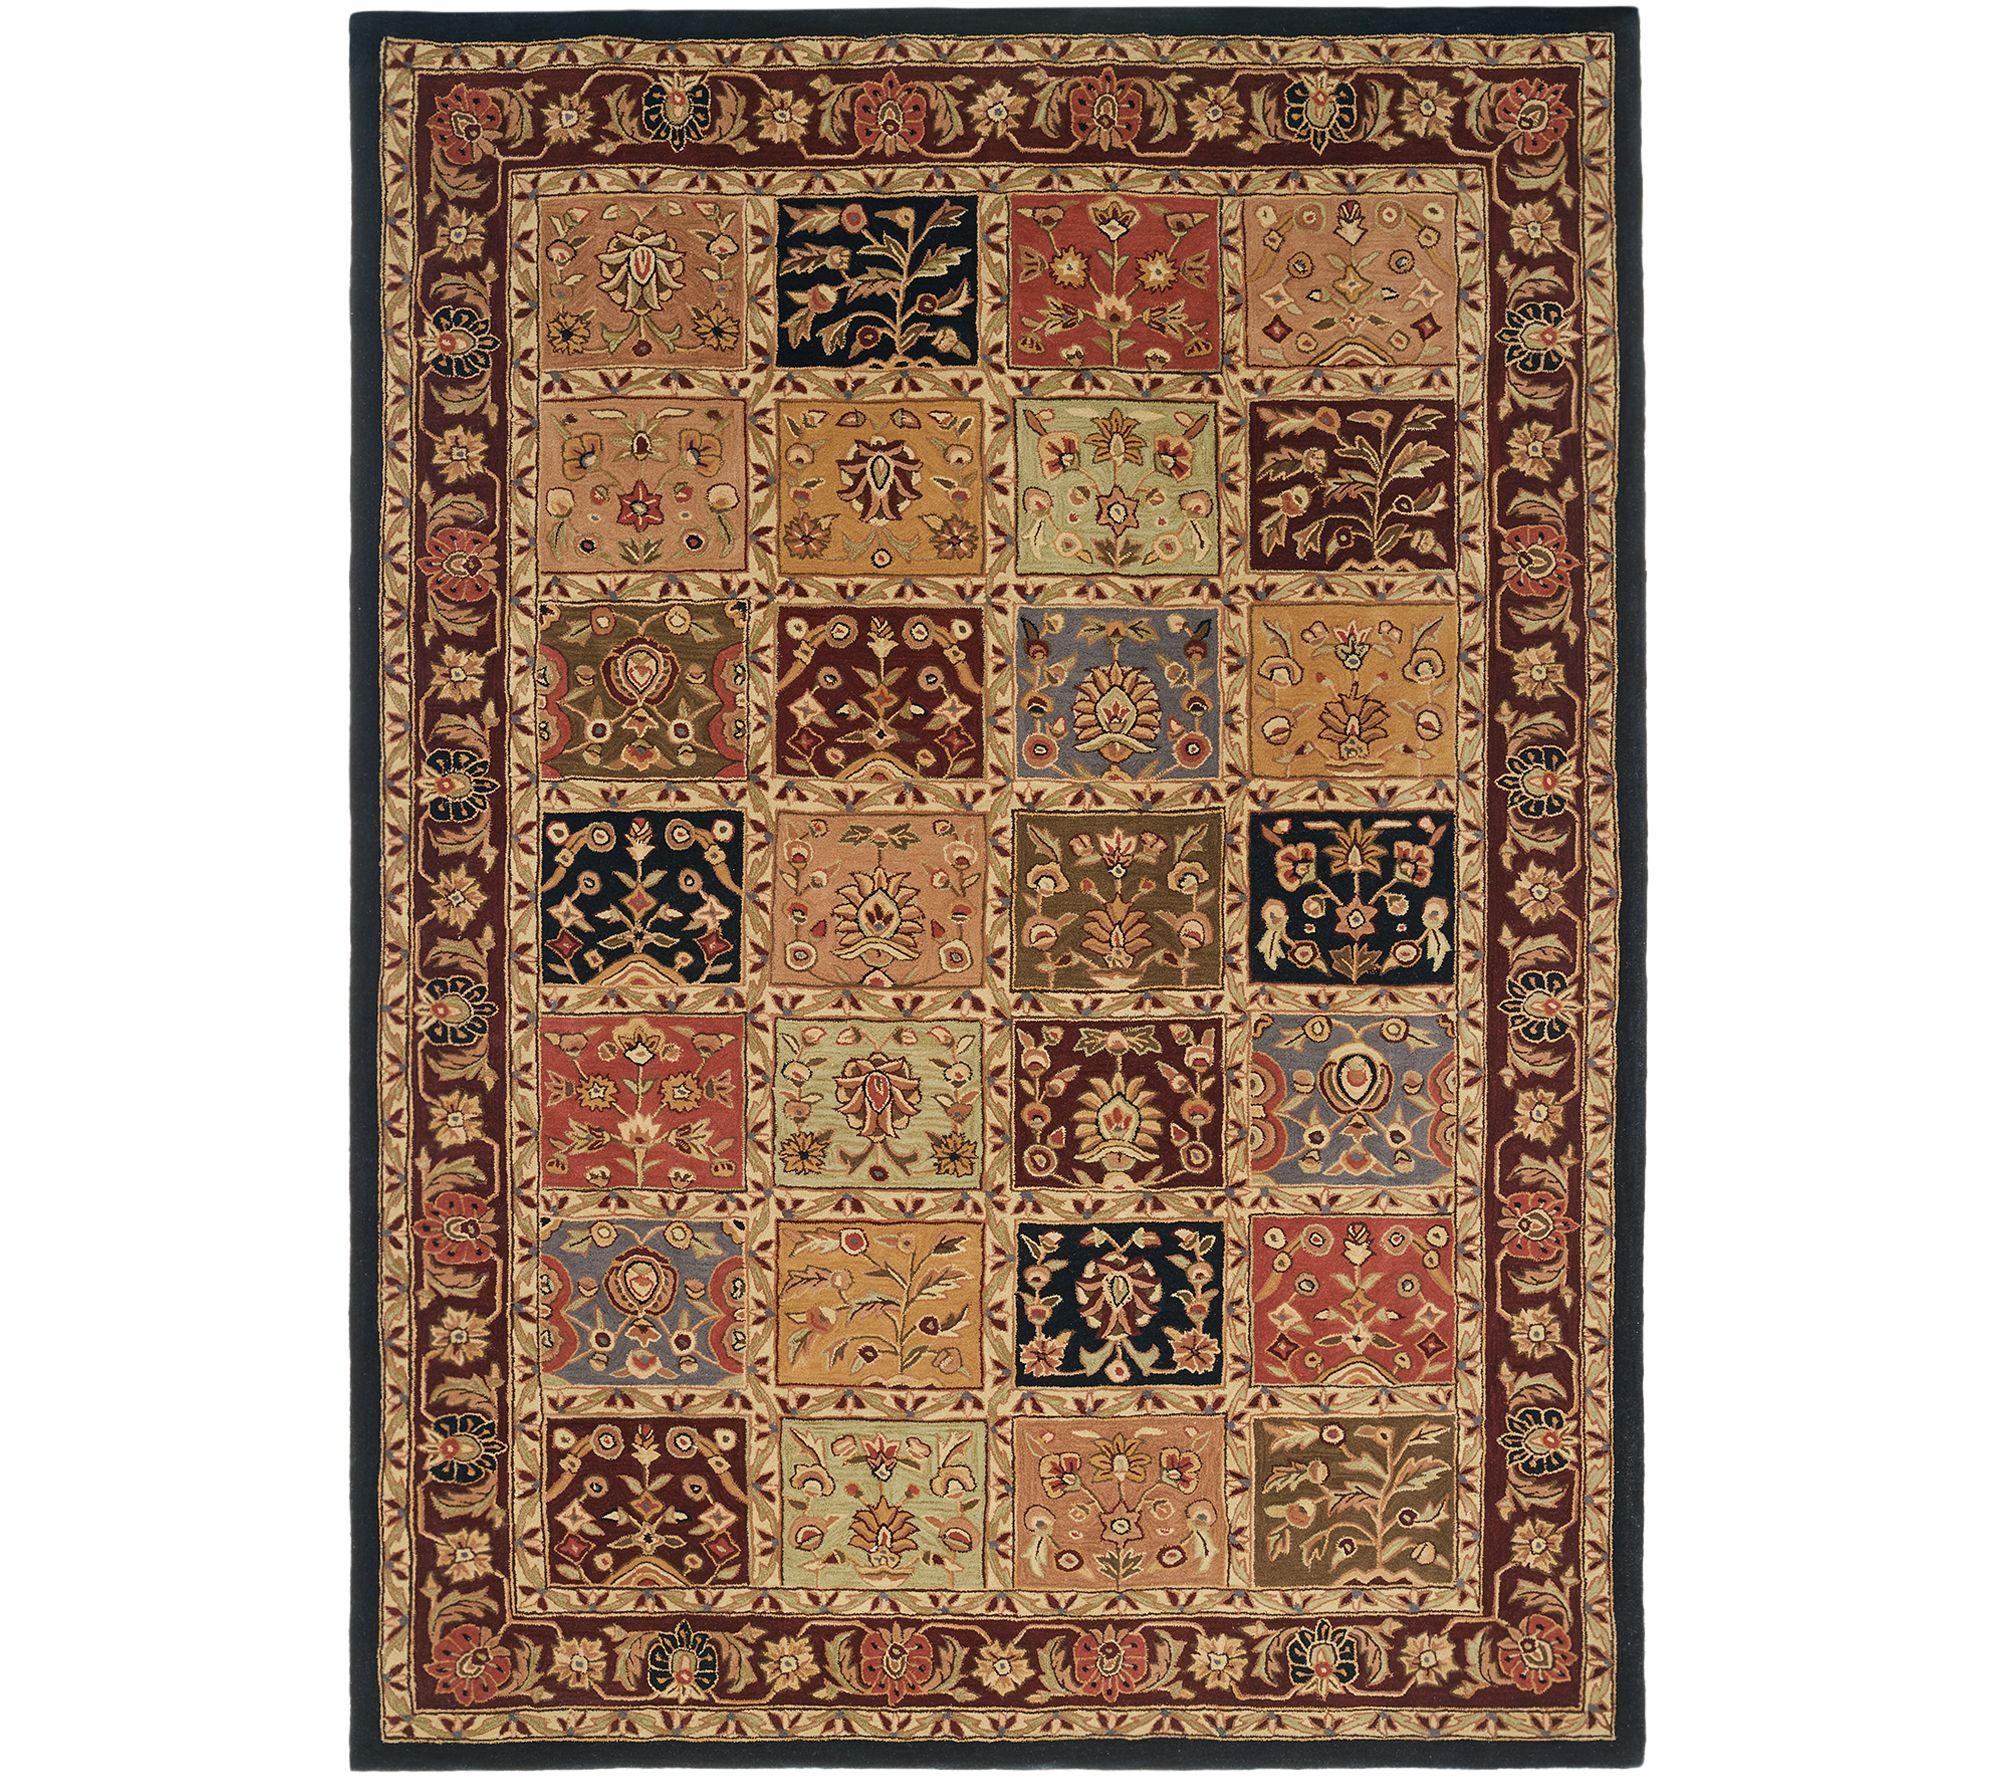 Qvc Carpets Floor Matttroy